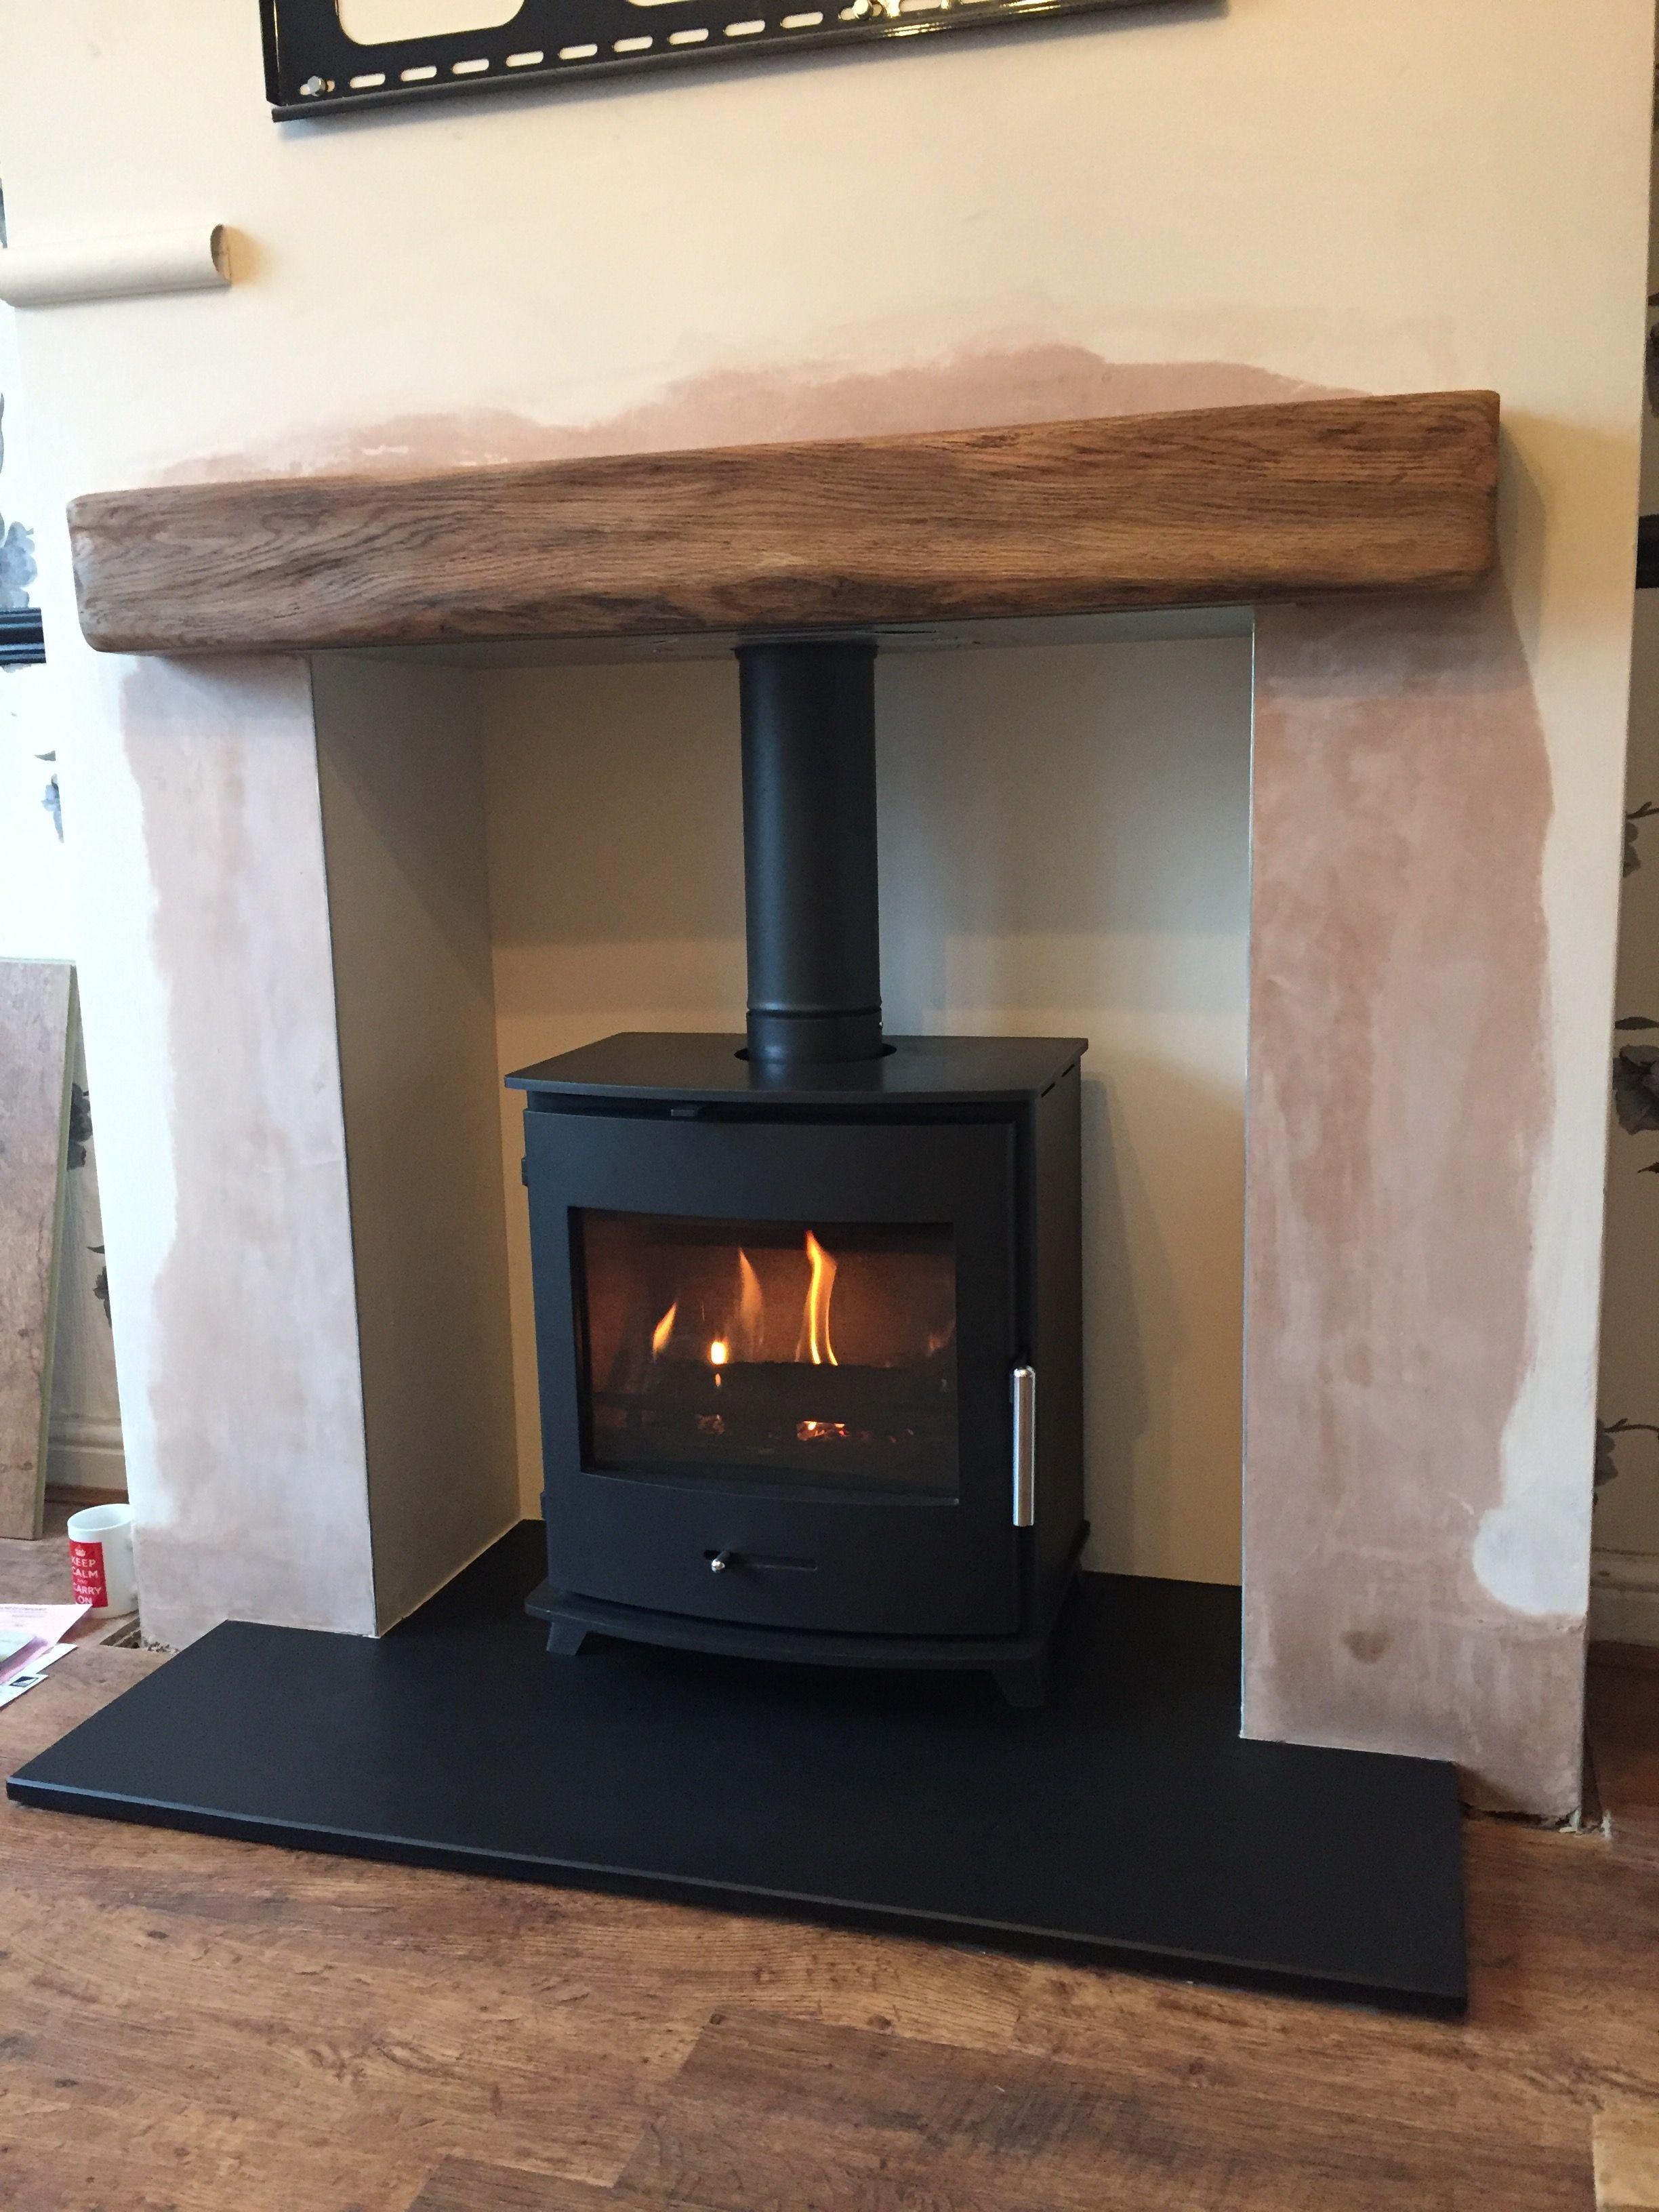 Pin By Ashley Seeba On Home Renovation Wood Burner Fireplace